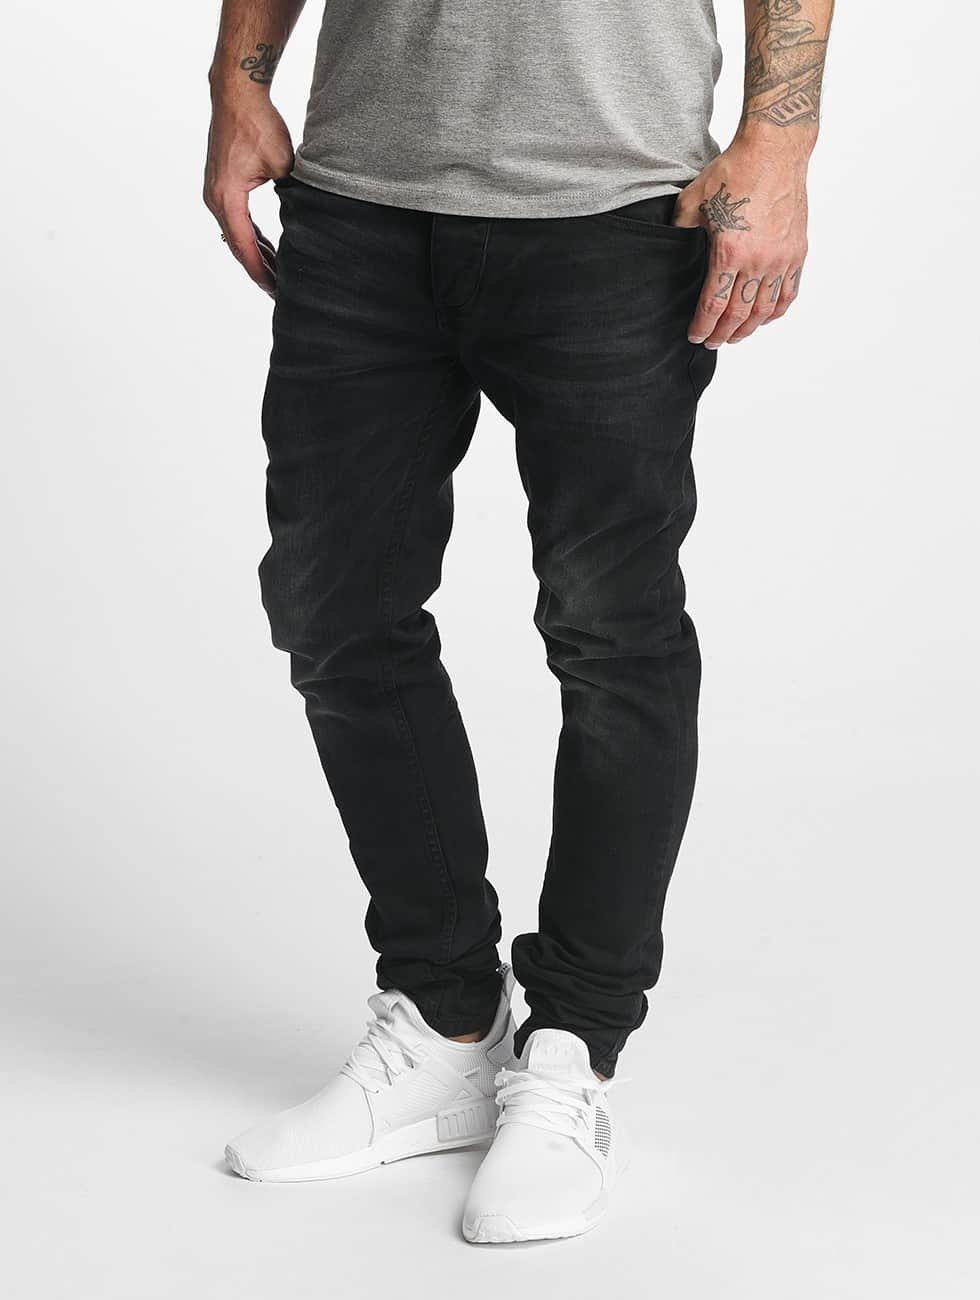 ID Denim Straight Fit Jeans Skinny Low Rise Tapered Leg black